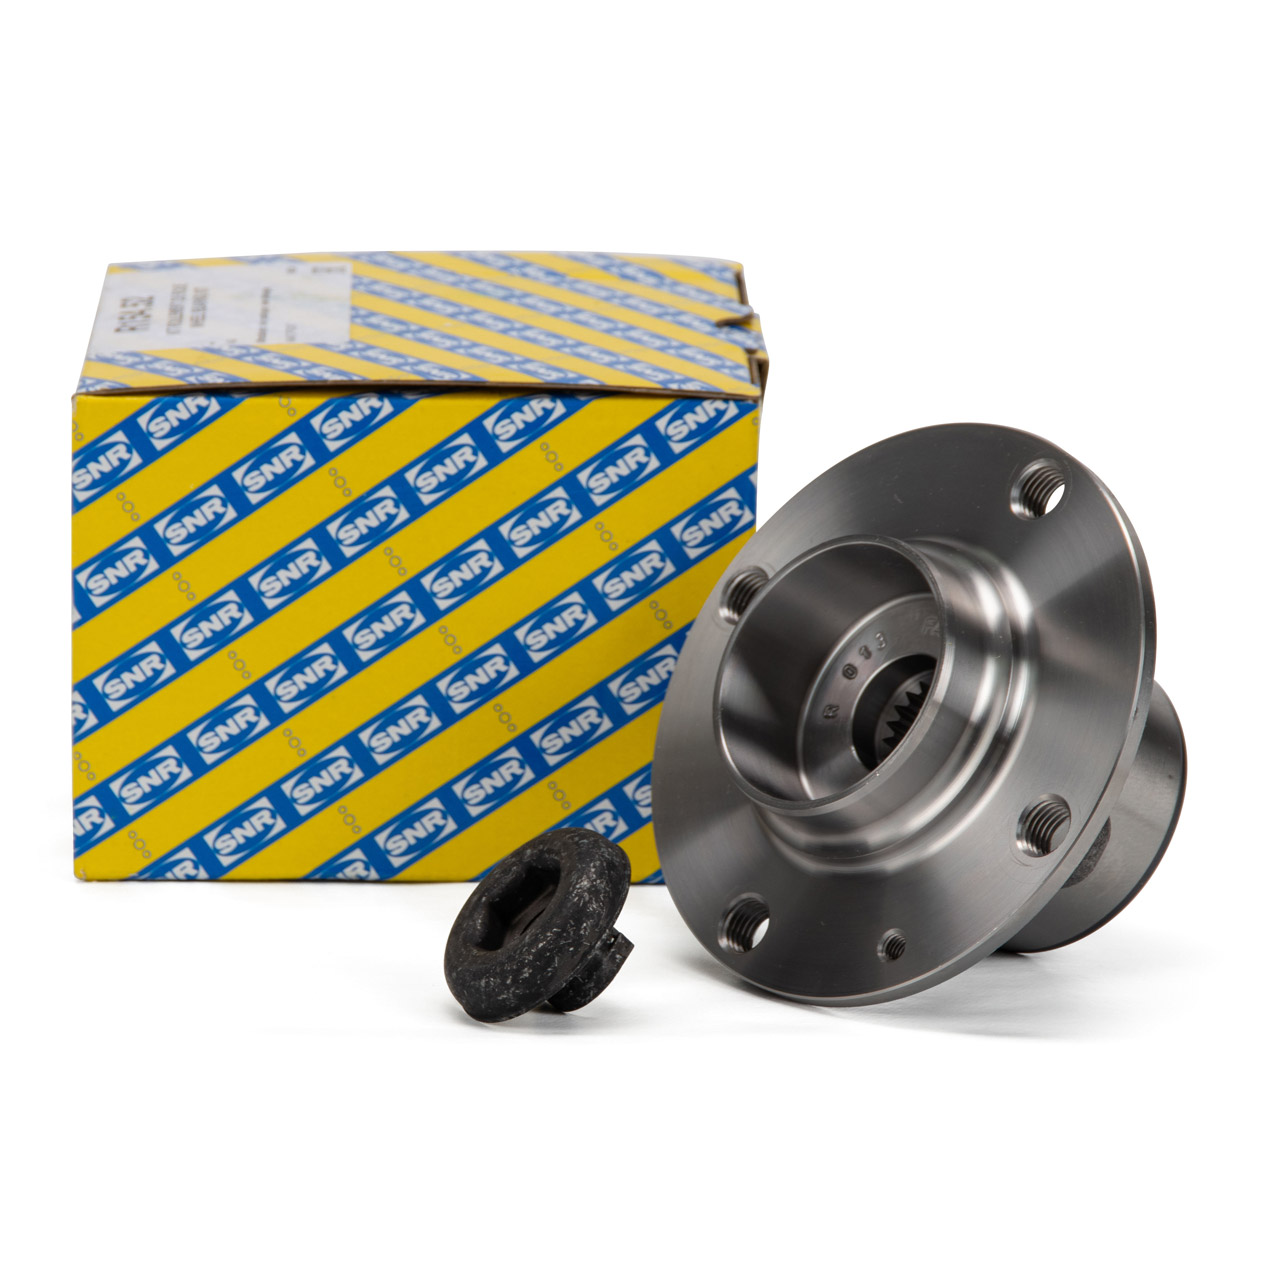 SNR R154.52 Radlagersatz AUDI A2 1.2 TDI VW Lupo 1.2 TDI 3L vorne 6E0407621C